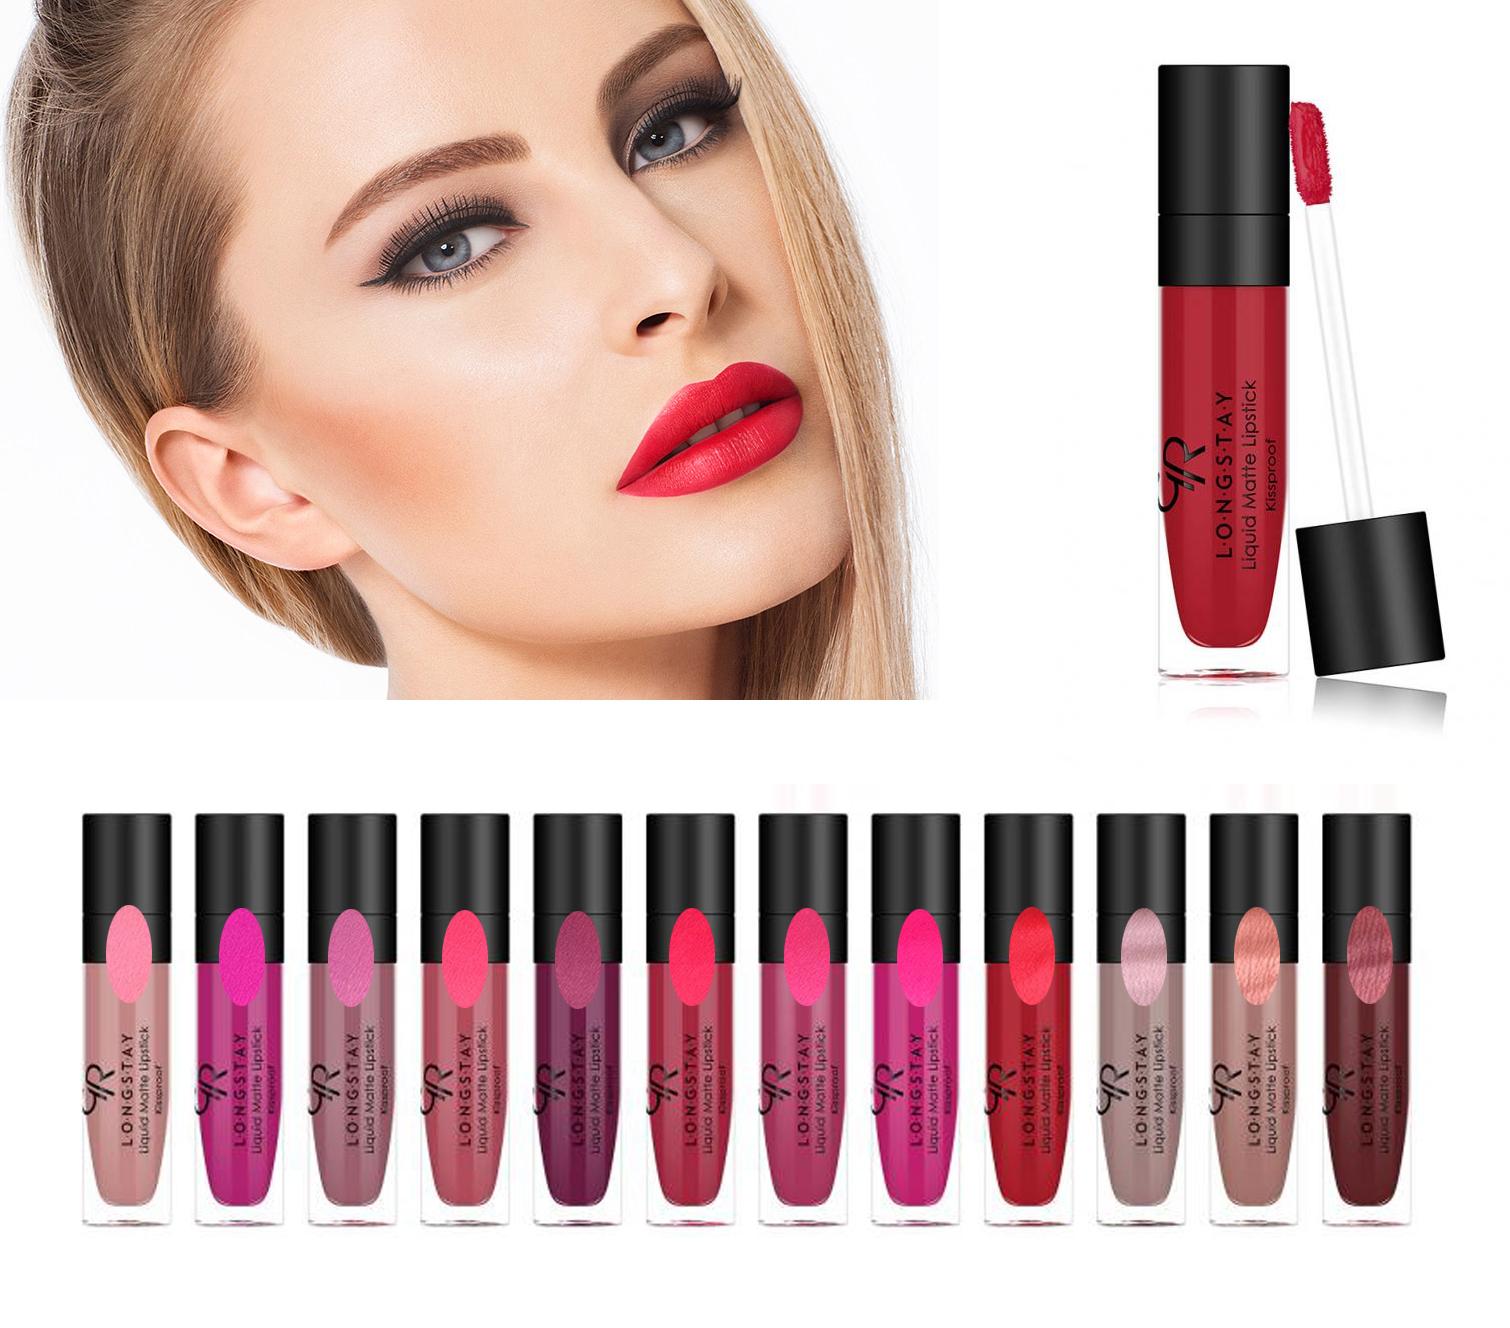 longstay_liquid_matte_lipstickb.jpg